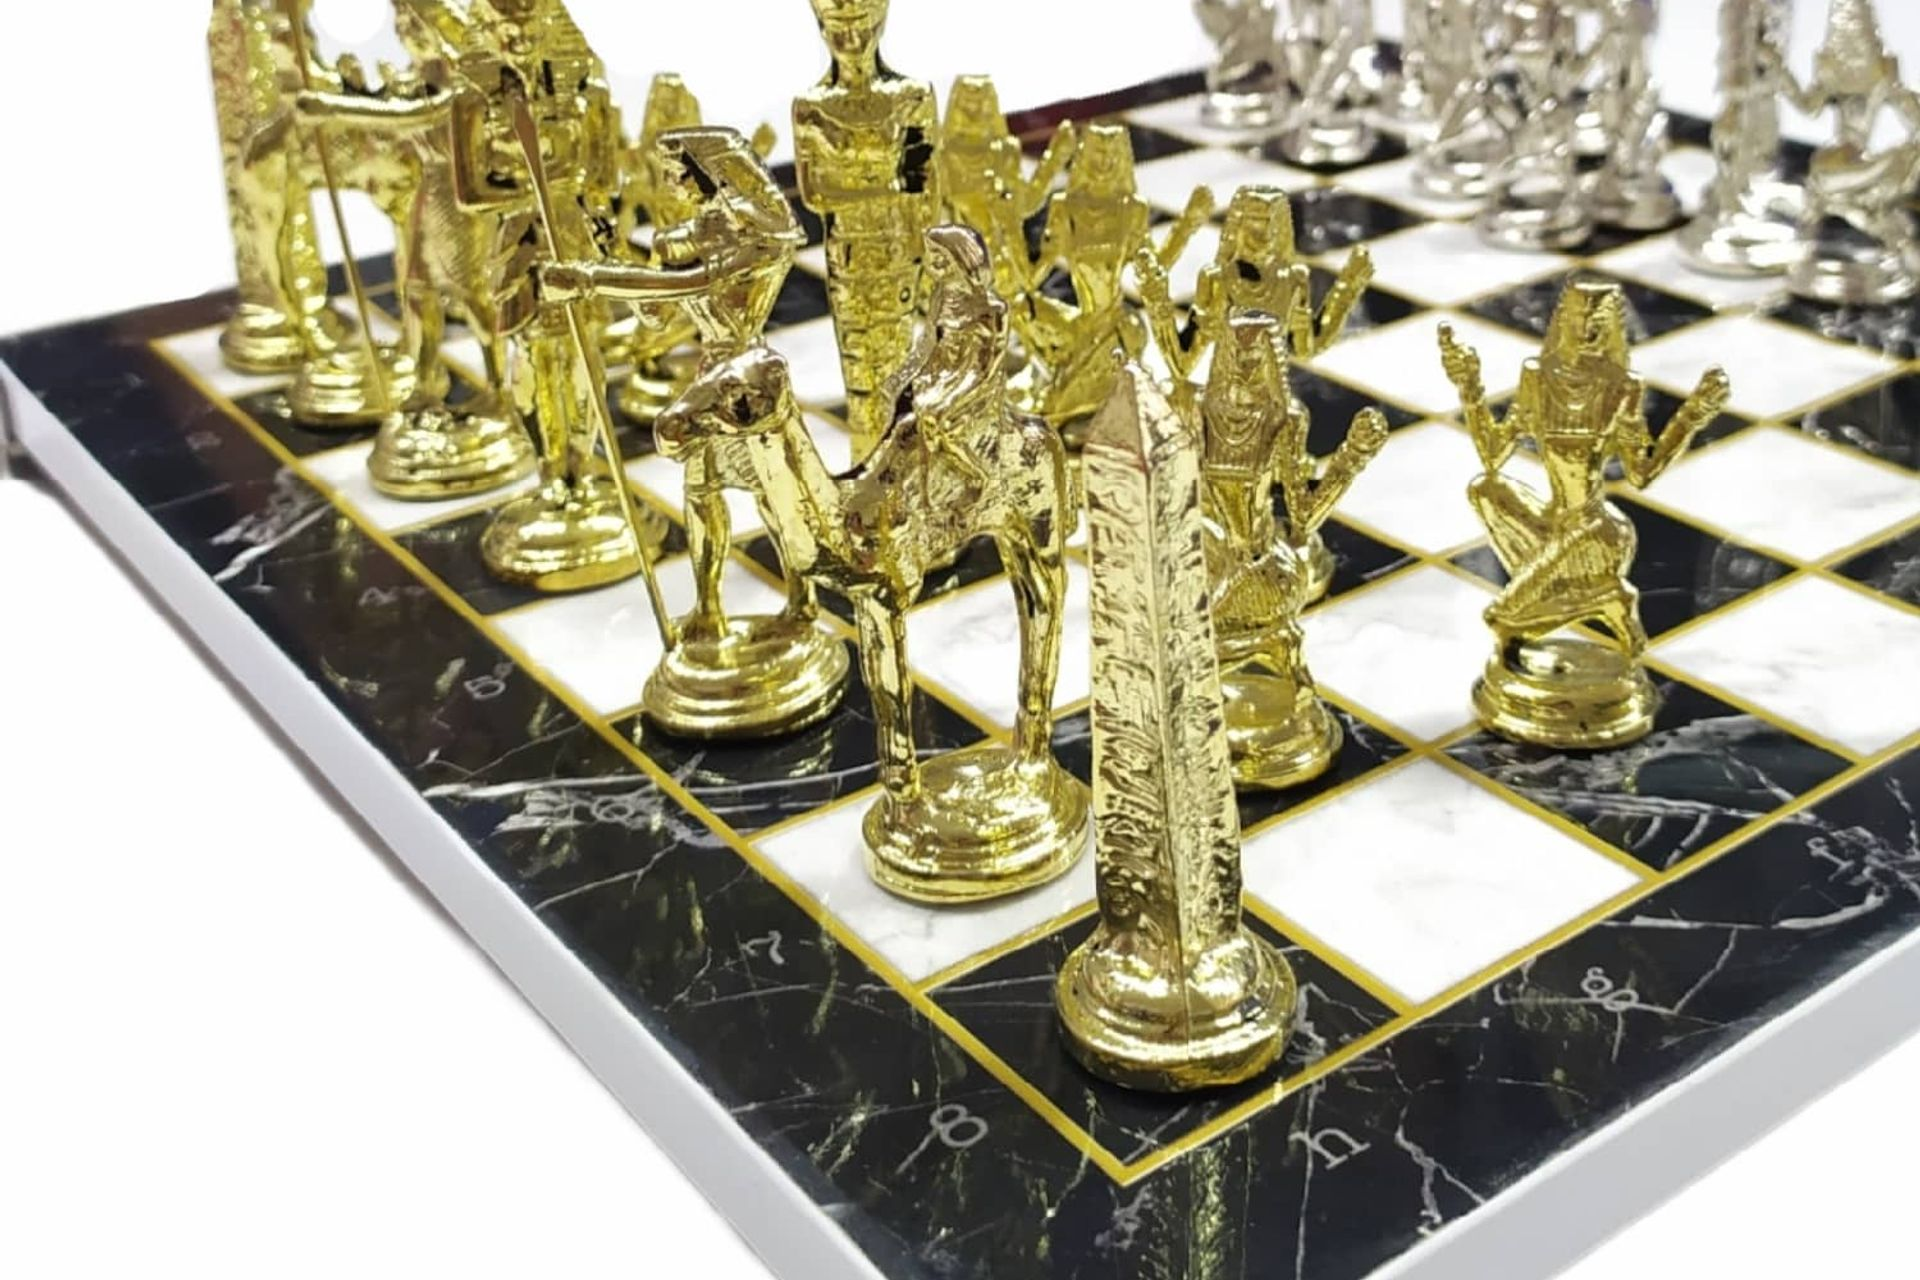 LİVAVA MEZOPOTAMYA FİGÜRLÜ SATRANÇ SETİ MERMER TABLALI GÜMÜŞ ALTIN